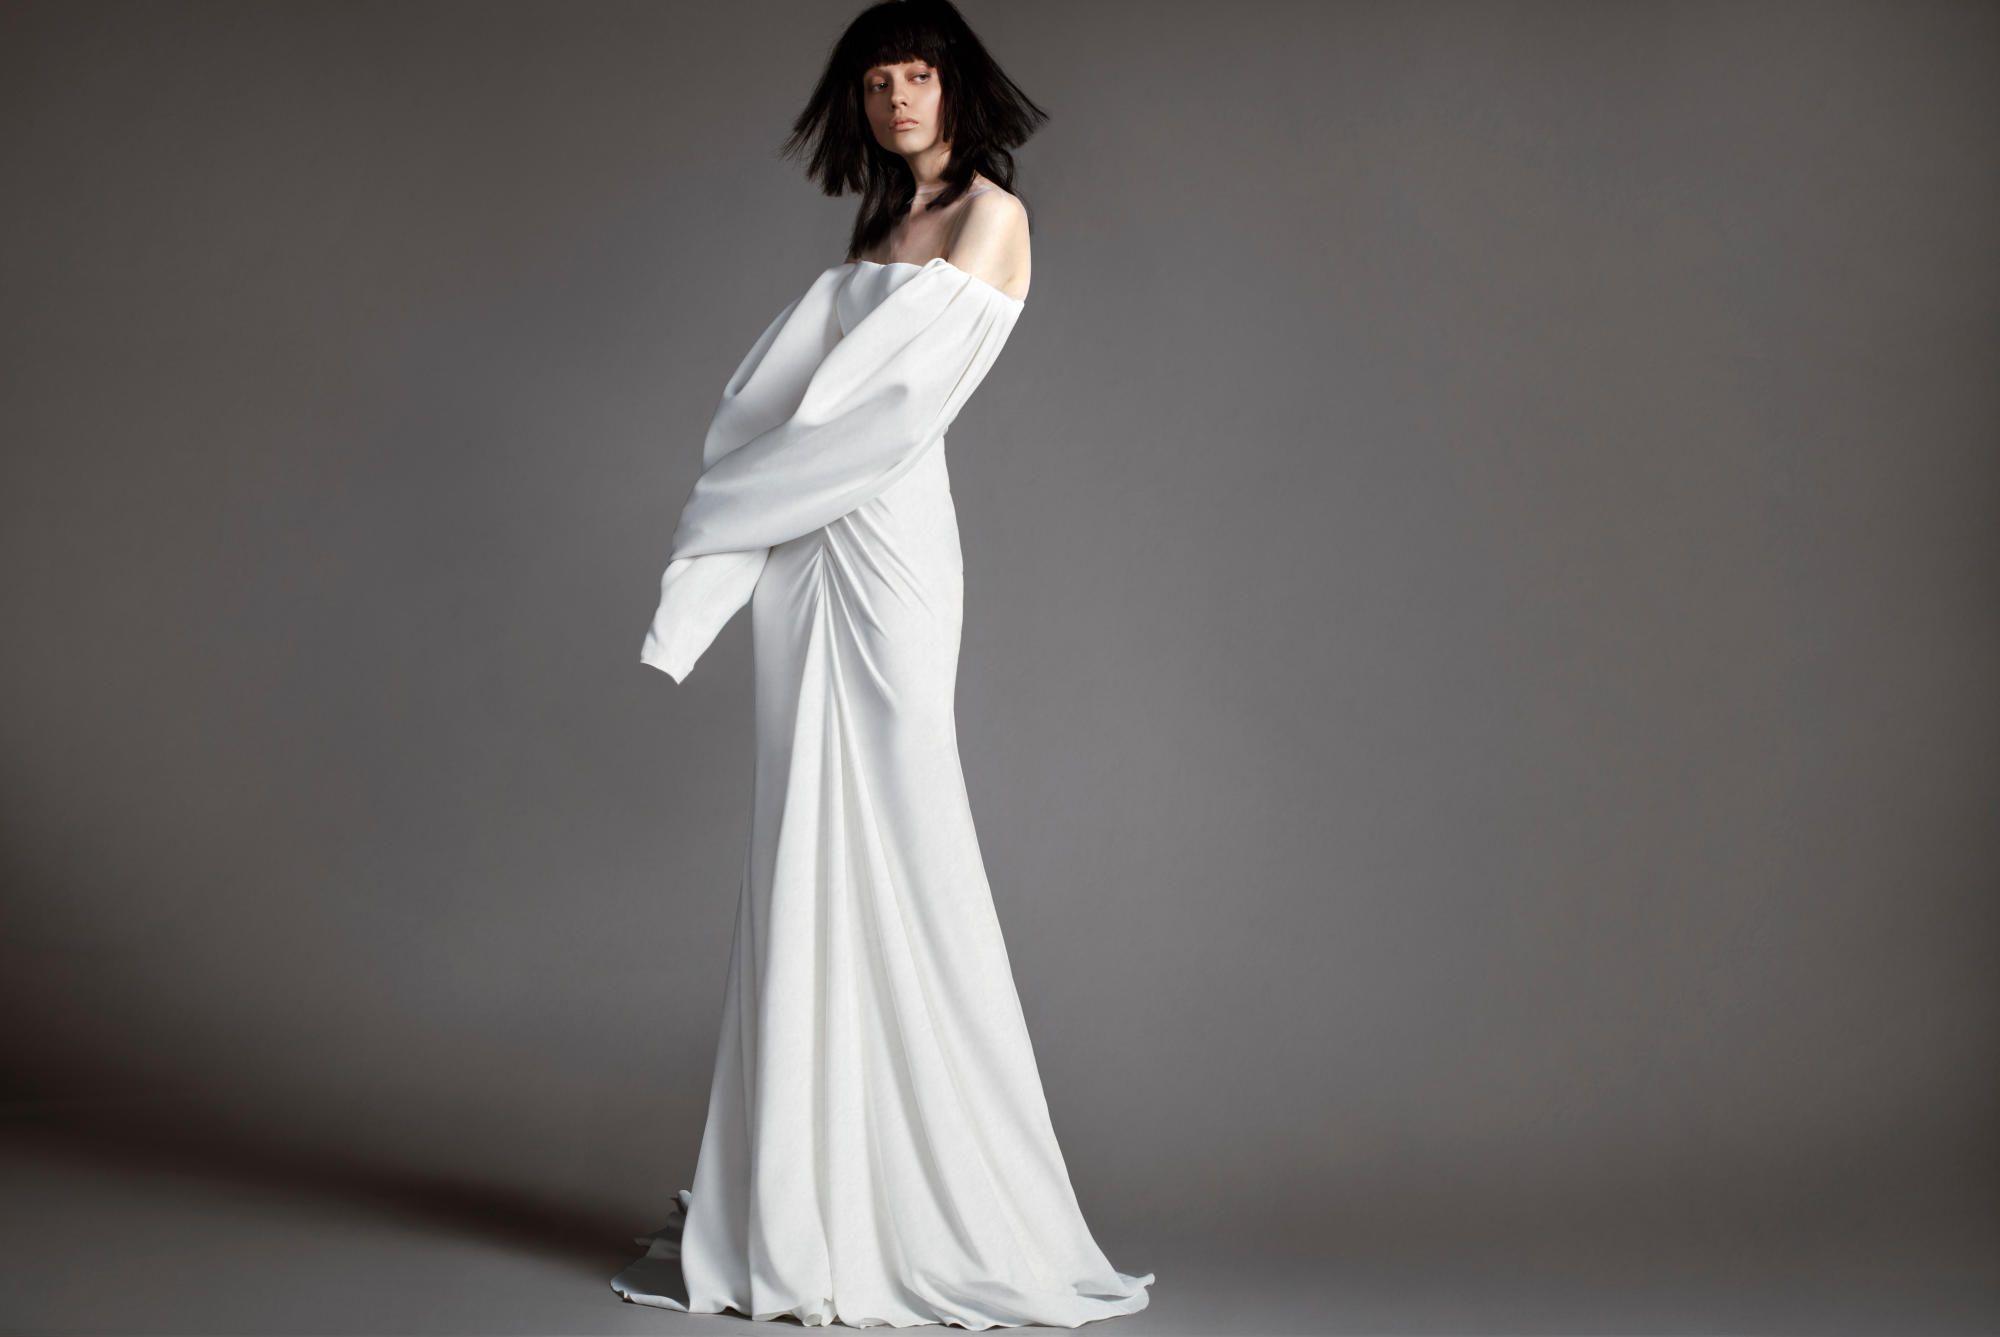 vera-wang-spring-2018-bridal-off-the-shoulder-puff-sleeve Tendências de vestidos de noiva para 2018